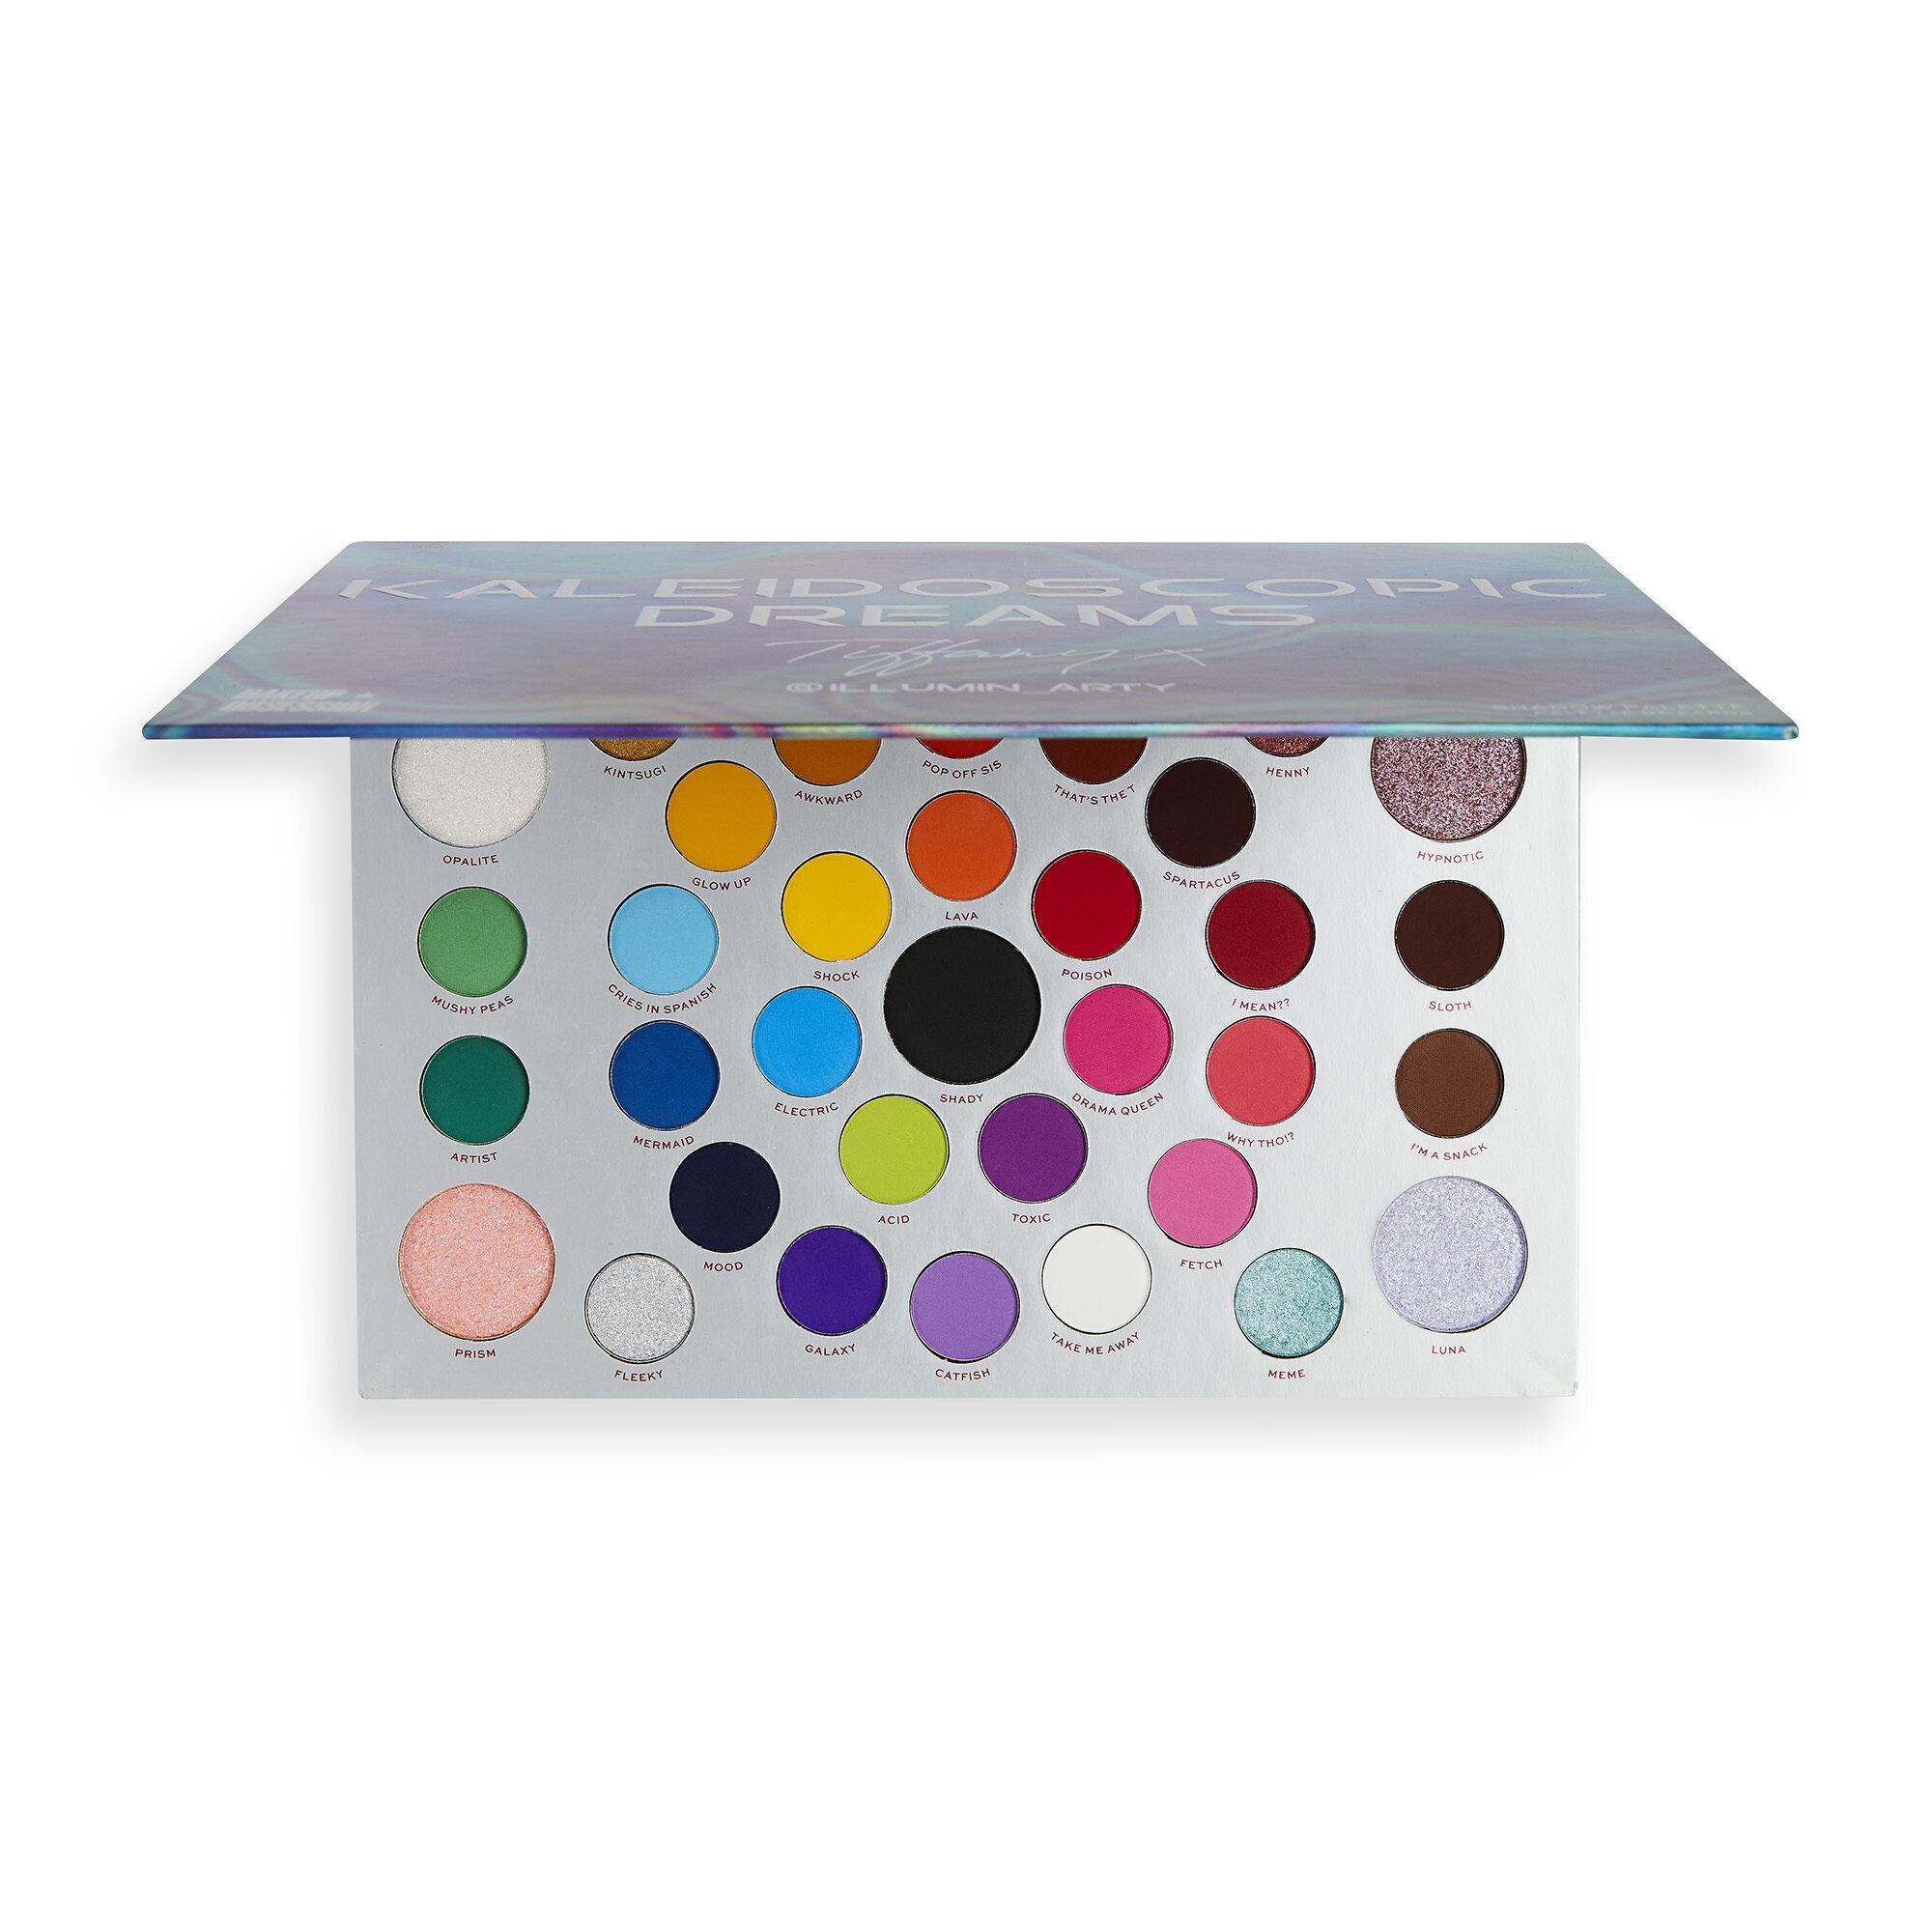 Paleta Kaleidoscopic Dreams Tiffany Illumin_arty X MAKEUP REVOLUTION